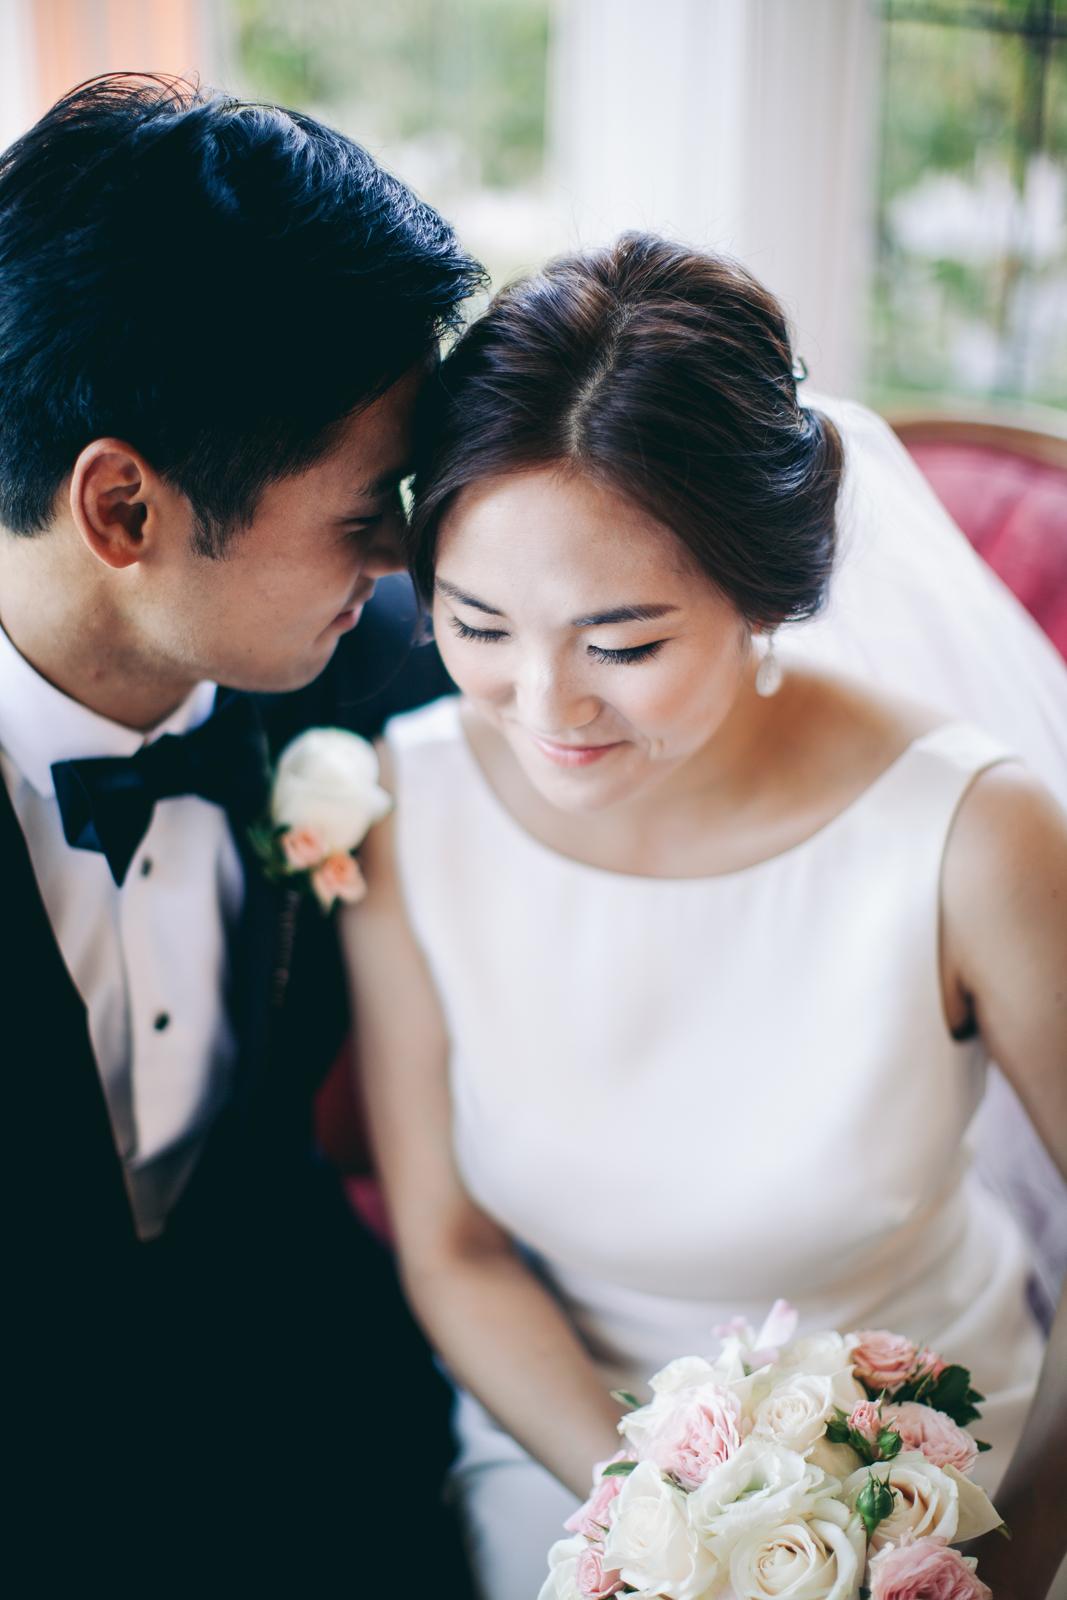 kohl_manison_wedding_photography_sarah_eric_ebony_siovhan_bokeh_photography_027.jpg